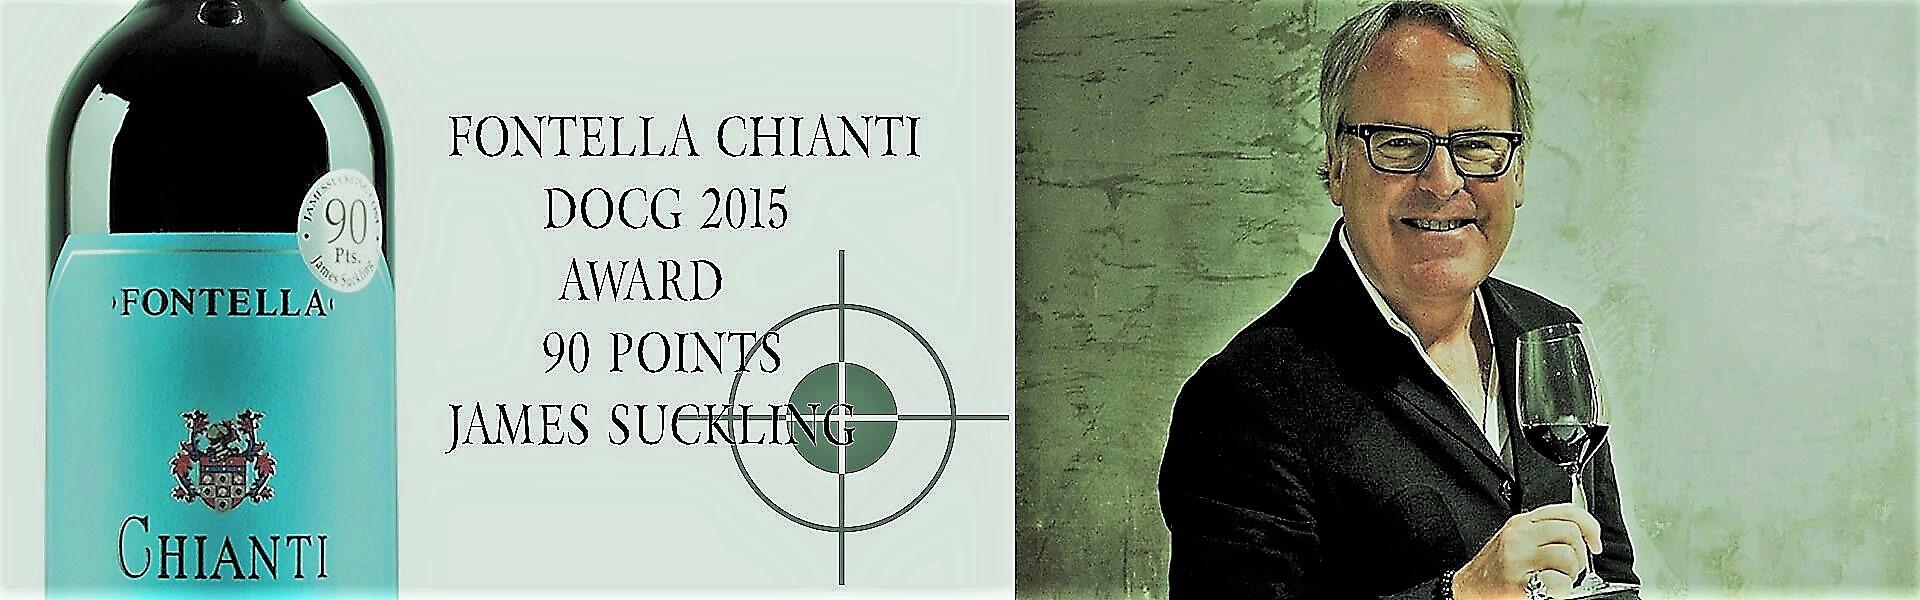 Banner Fontella Chianti